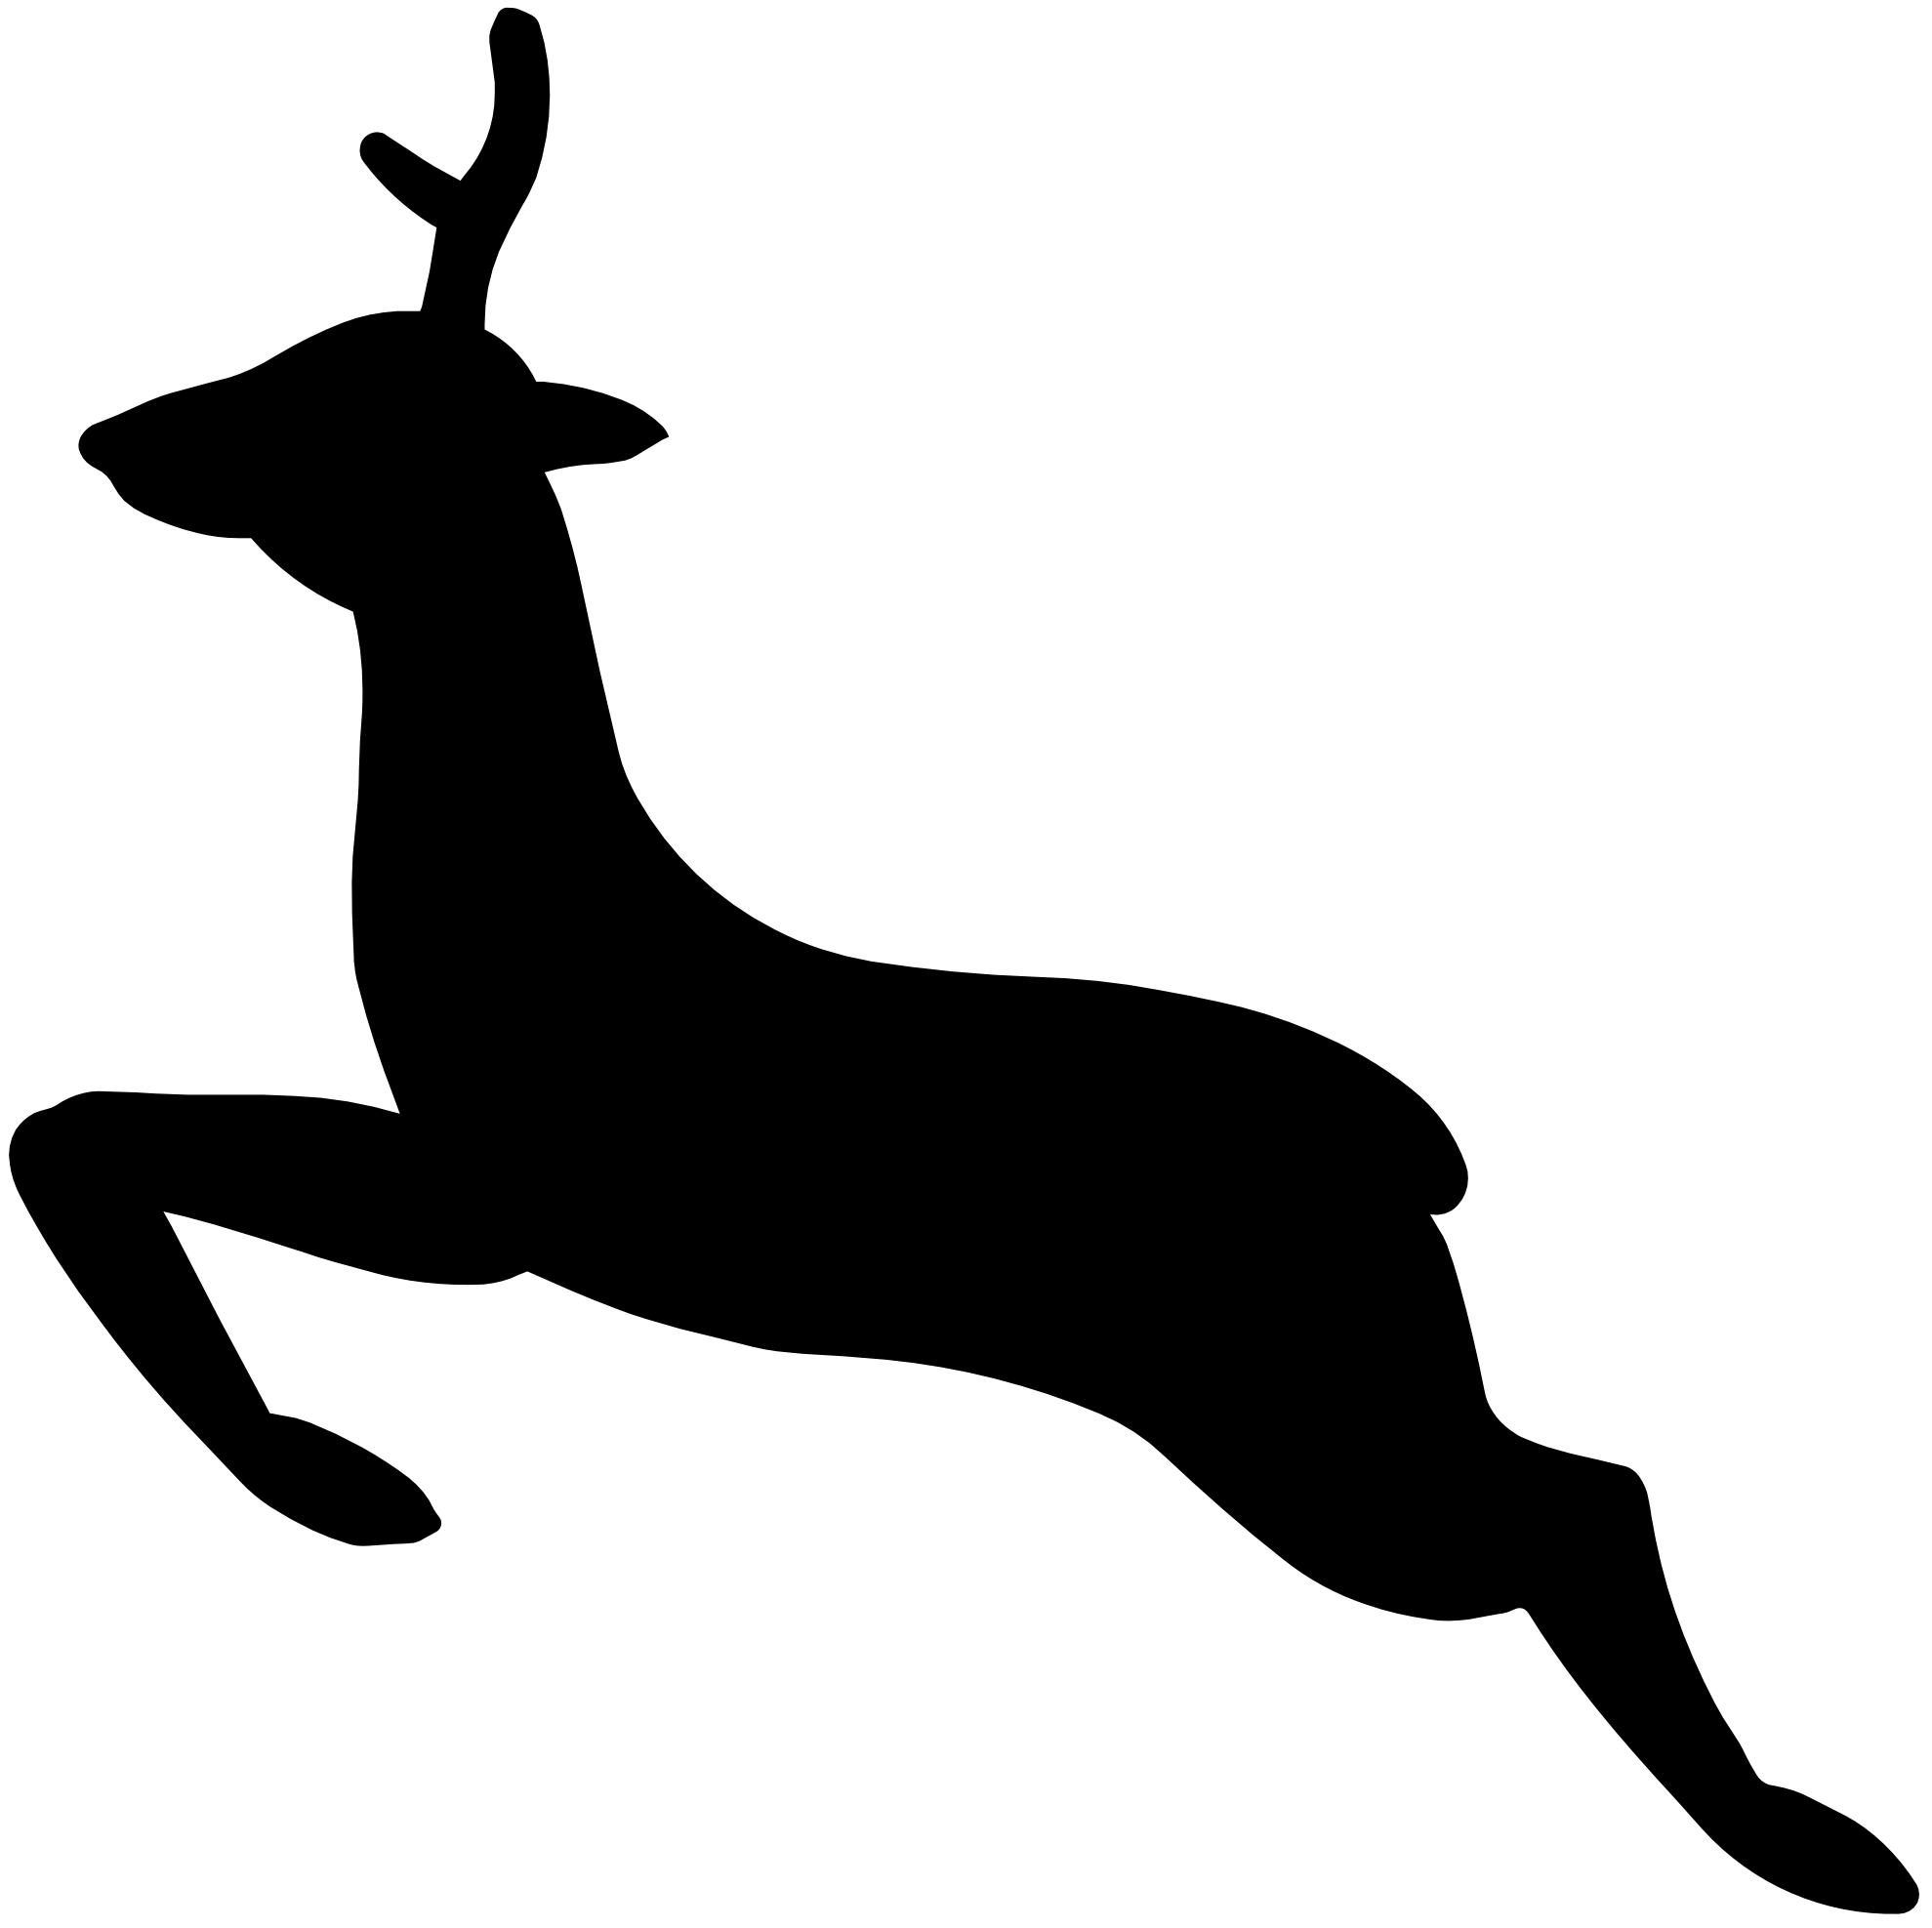 1979x1975 White Stag Cliparts 275132